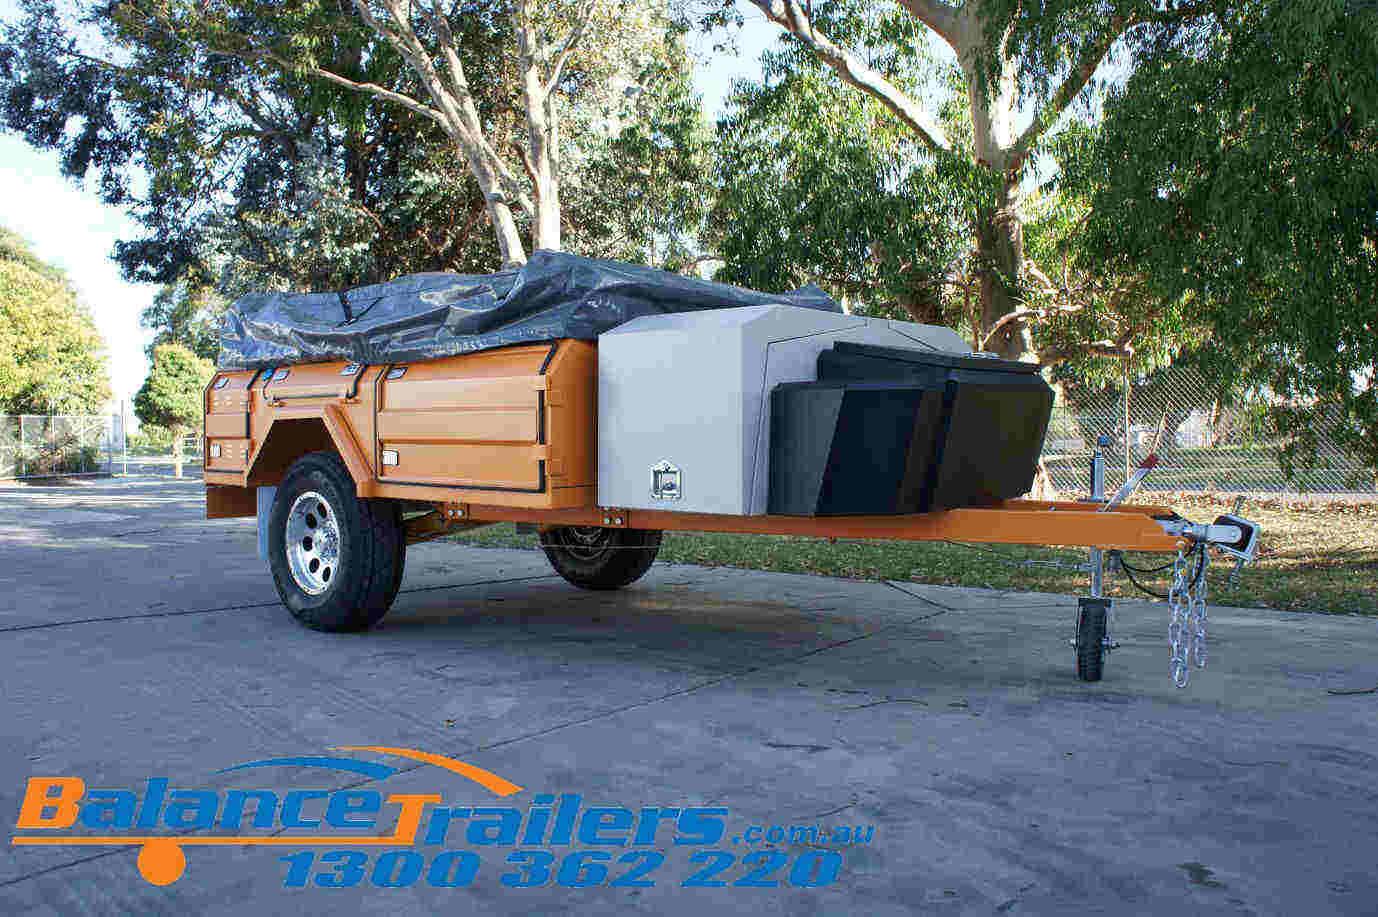 Walk-in Design Off Road Soft Floor Camper Trailer (Model No: BT01SF)